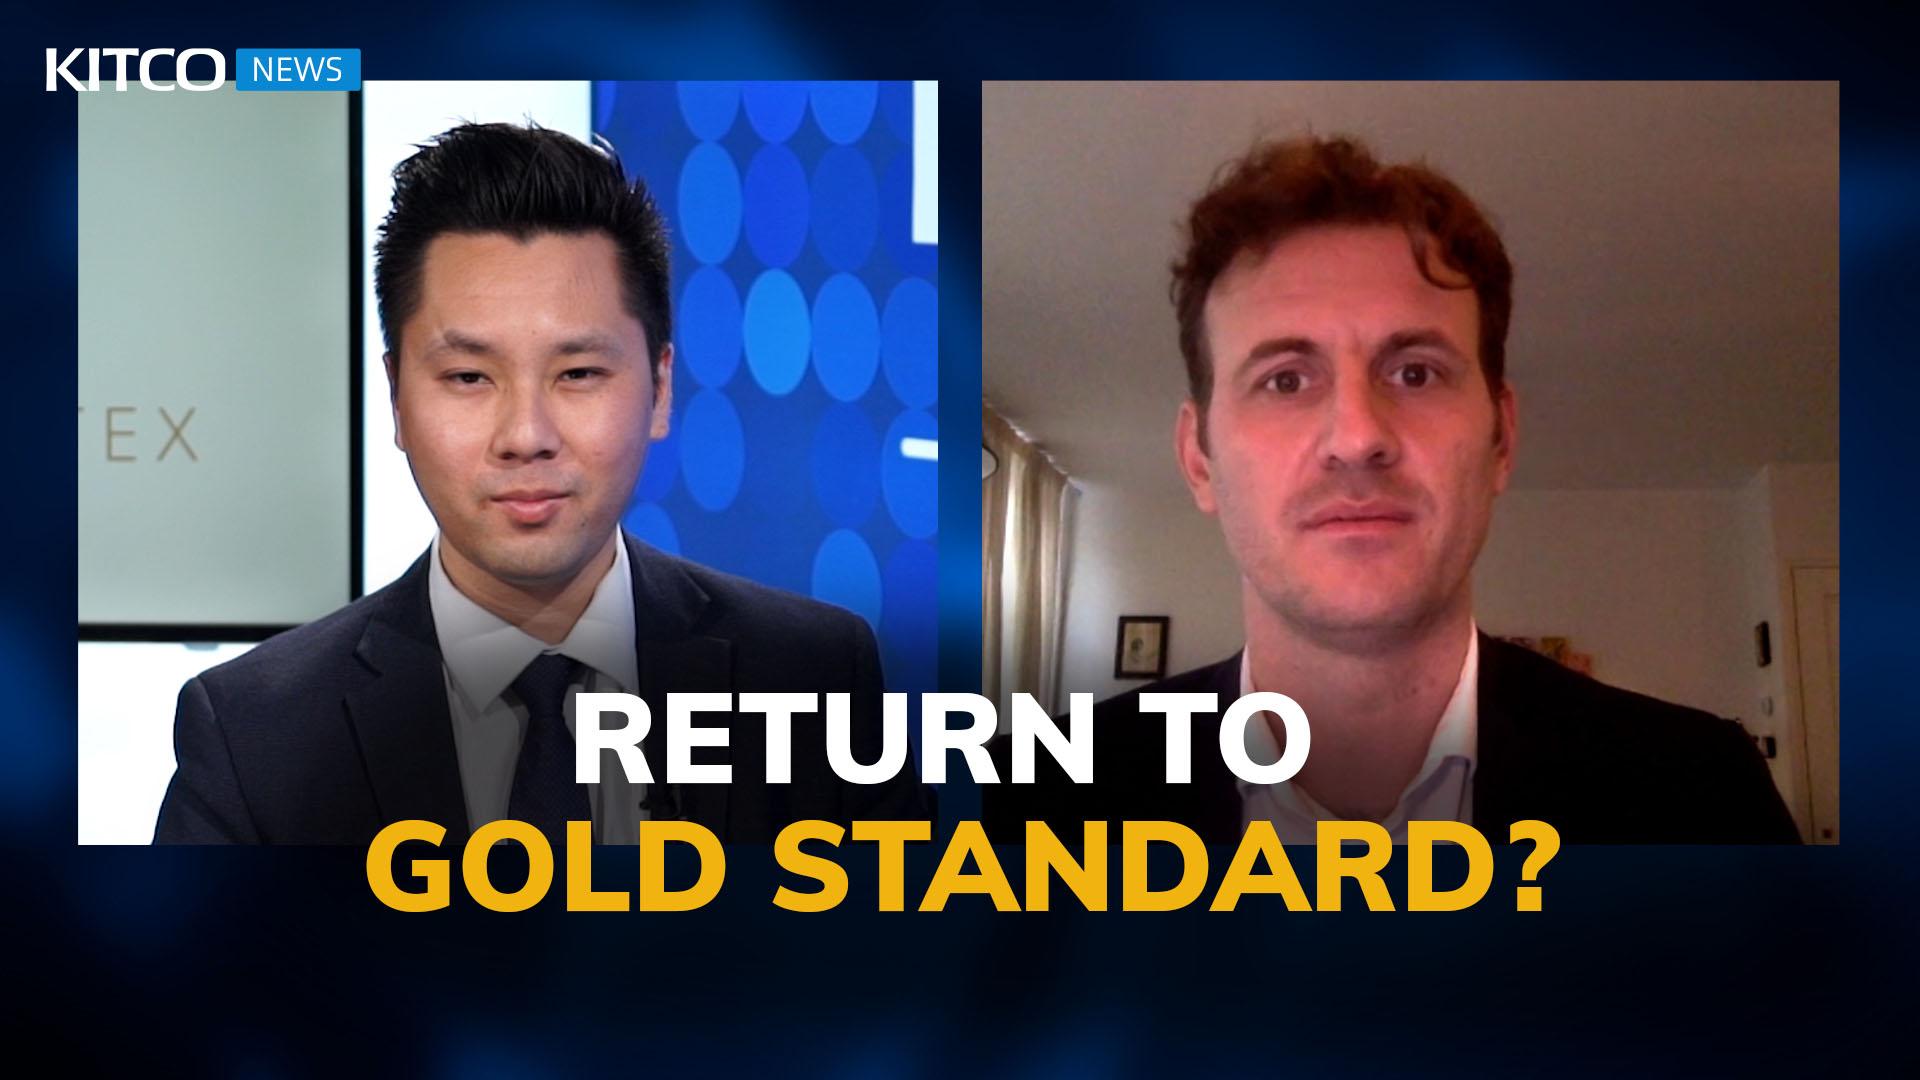 A new gold standard is coming, brace for 'monetary reset' - Jan Nieuwenhuijs